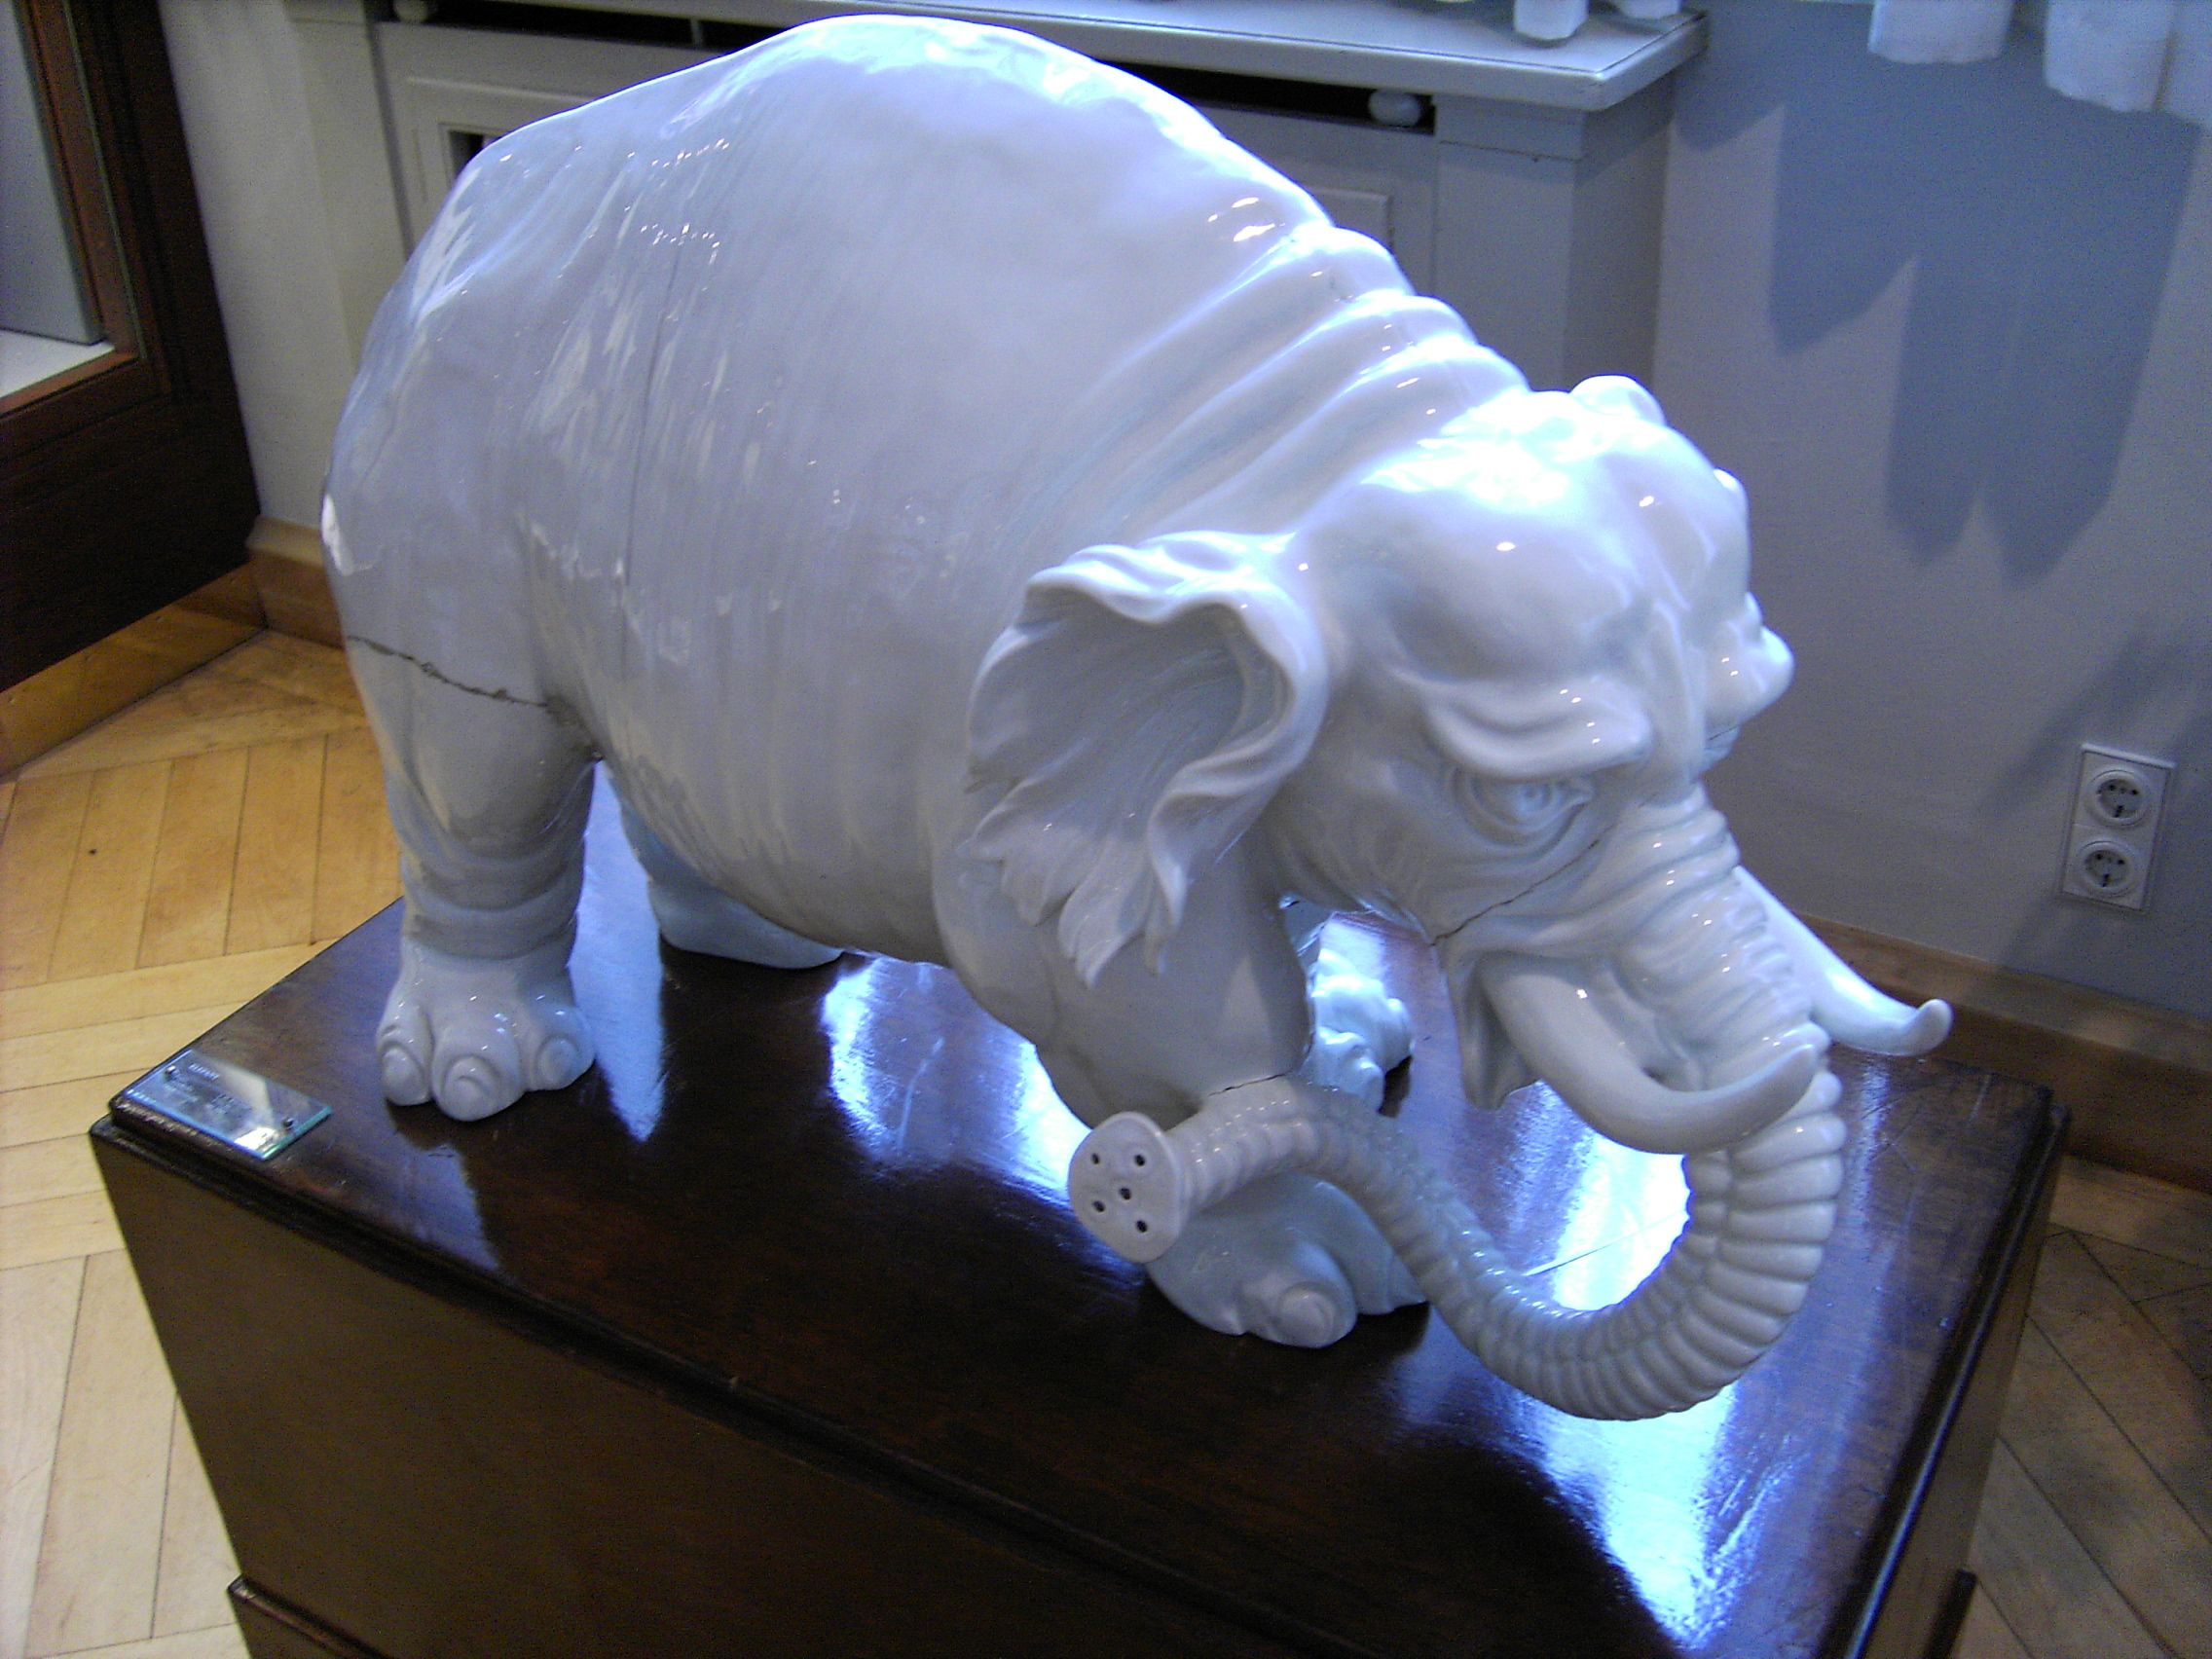 File:Meissen-Porcelain-Elephant JPG - Wikimedia Commons